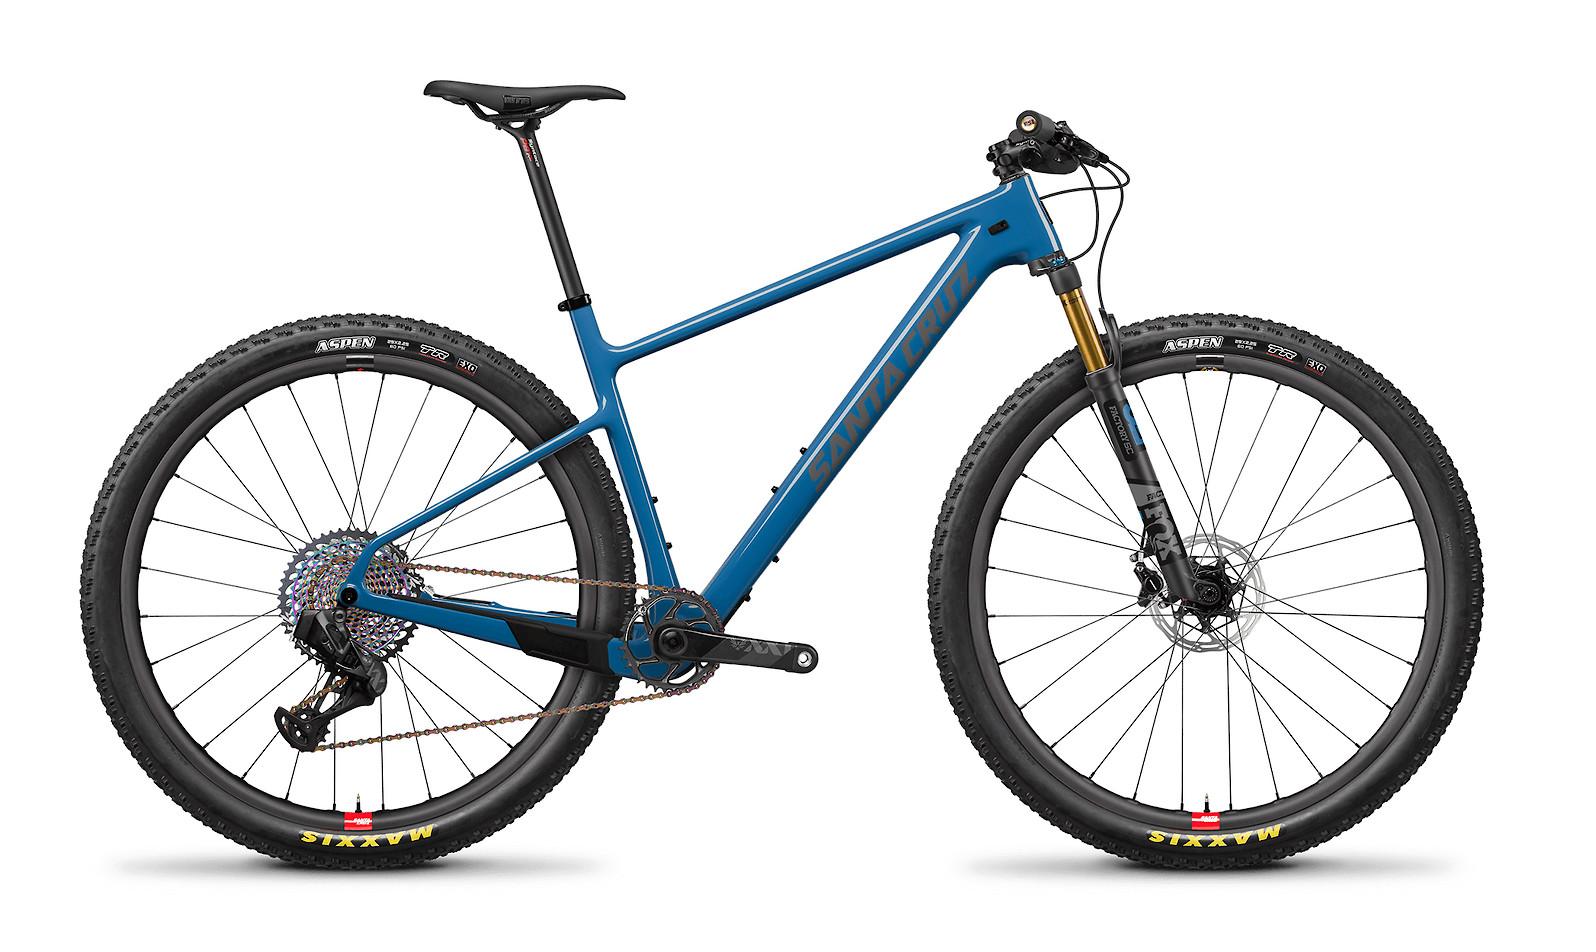 2020 Santa Cruz Highball Carbon CC XX1 AXS Reserve (WC Blue and Primer)